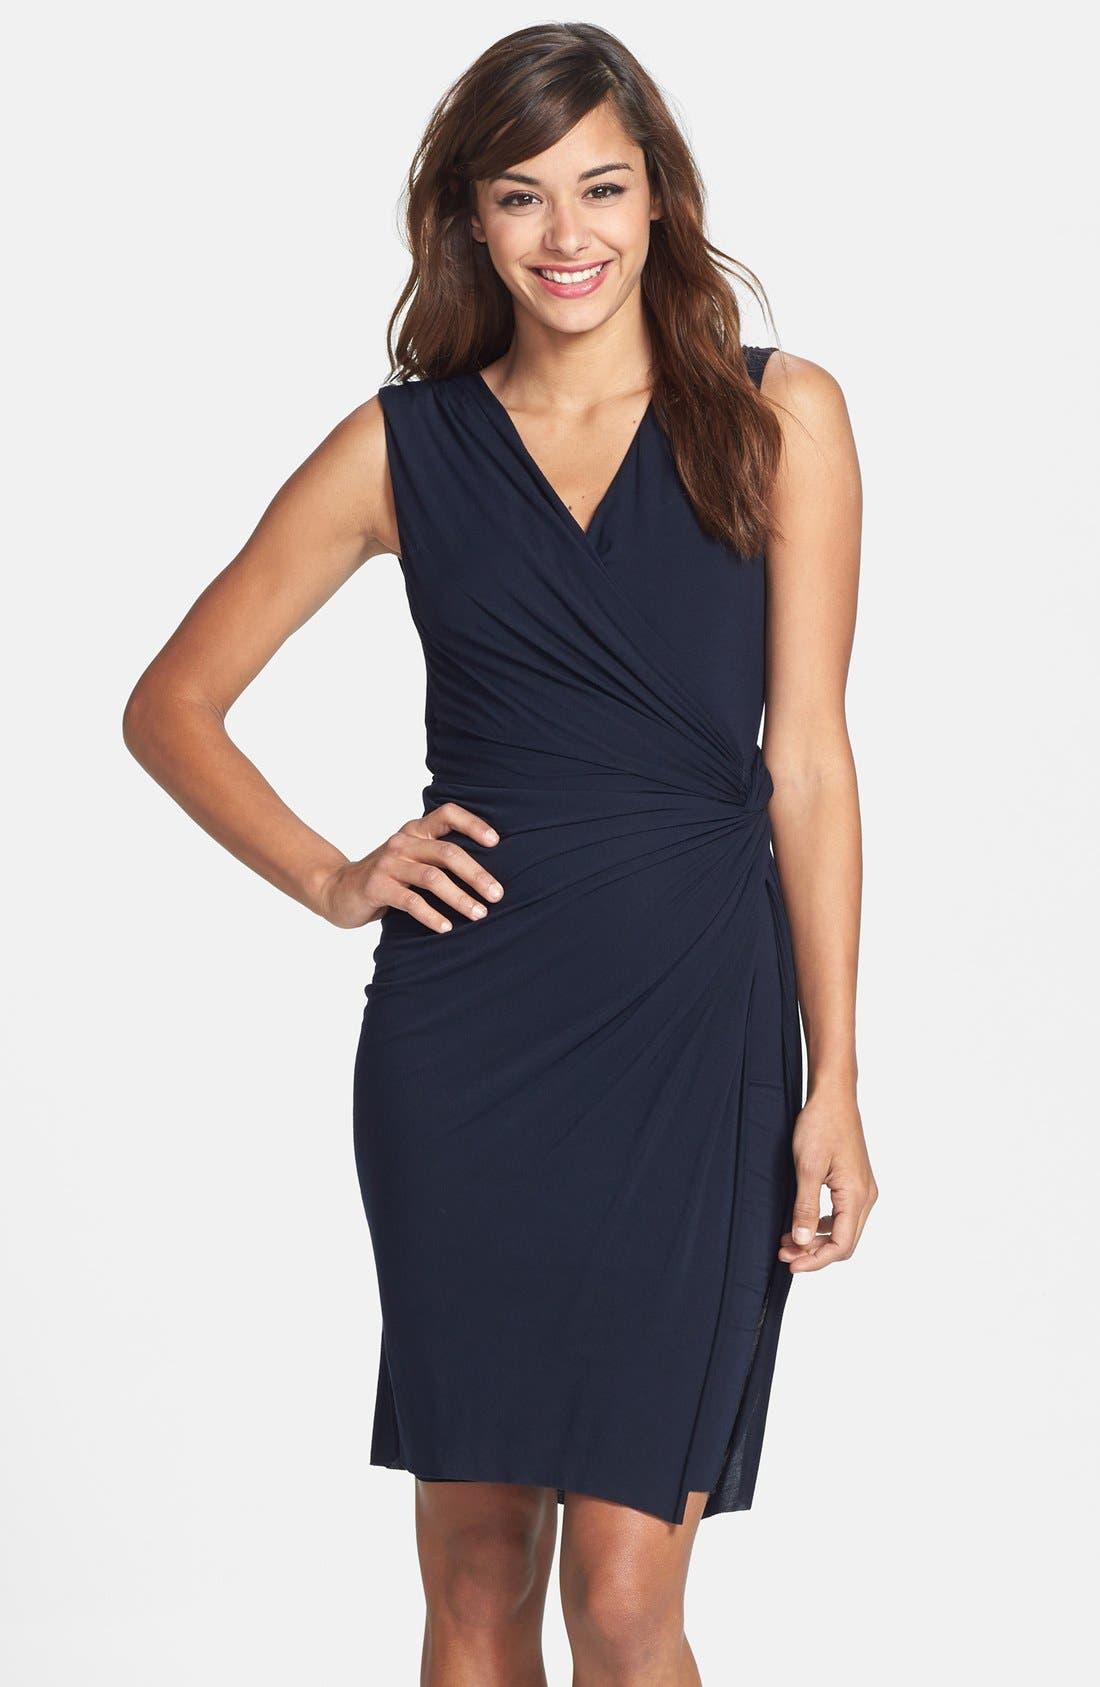 Alternate Image 1 Selected - B44 Dressed by Bailey 44 'Drop Kick' Faux Wrap Jersey Dress